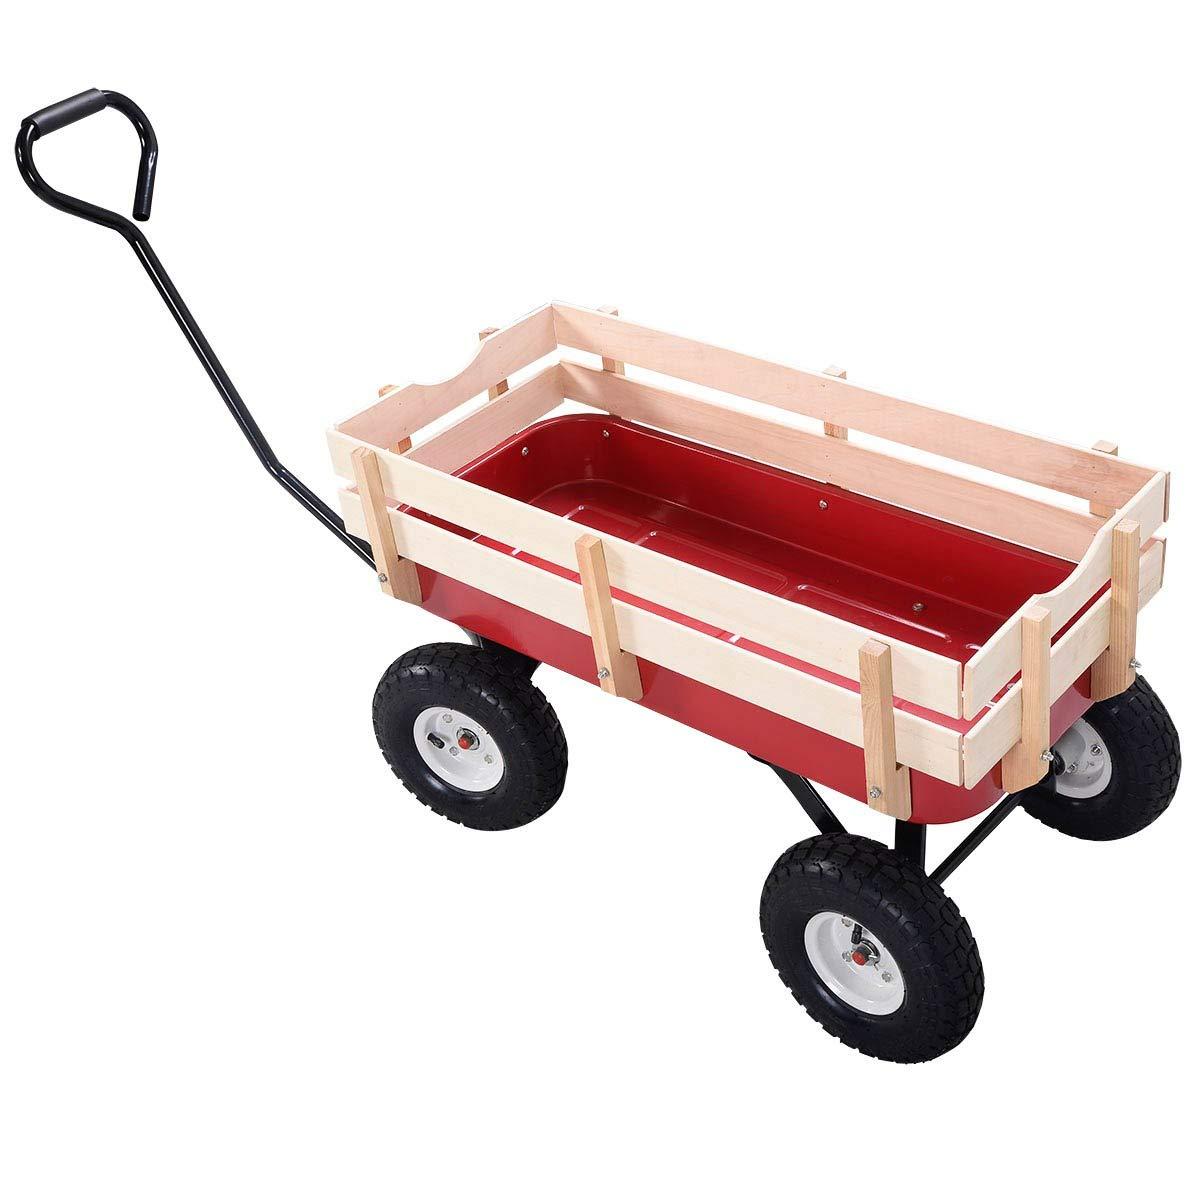 EnjoyShop2018 Outdoor Pulling Garden Cart Wagon with Wood Railing All-Steel Construction by EnjoyShop2018